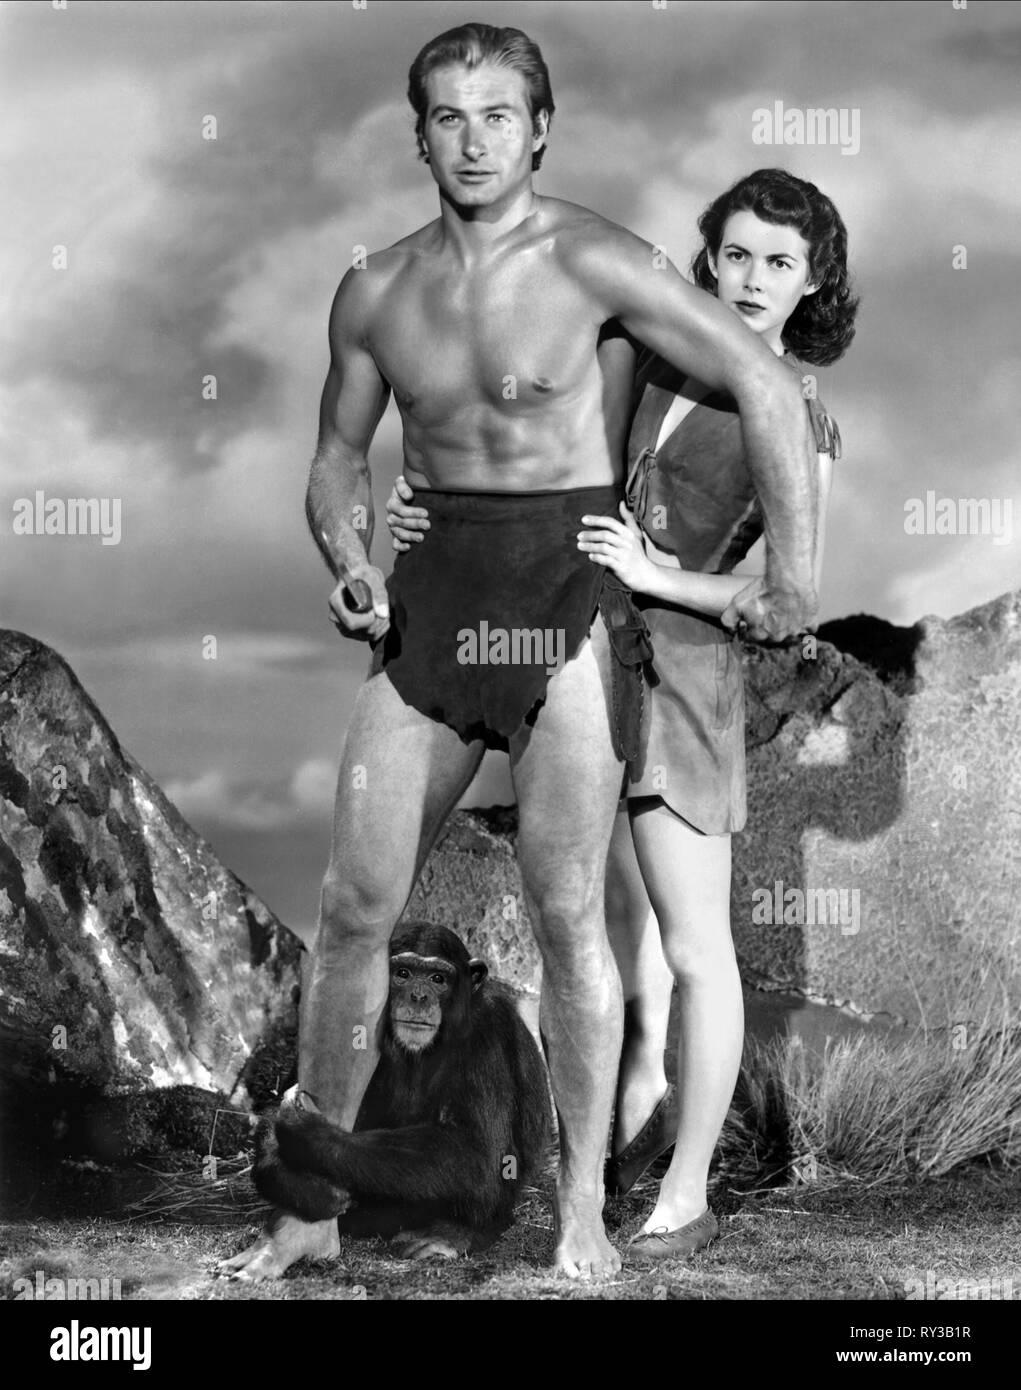 BARKER,BROWN, TARZAN AND THE SLAVE GIRL, 1950 - Stock Image